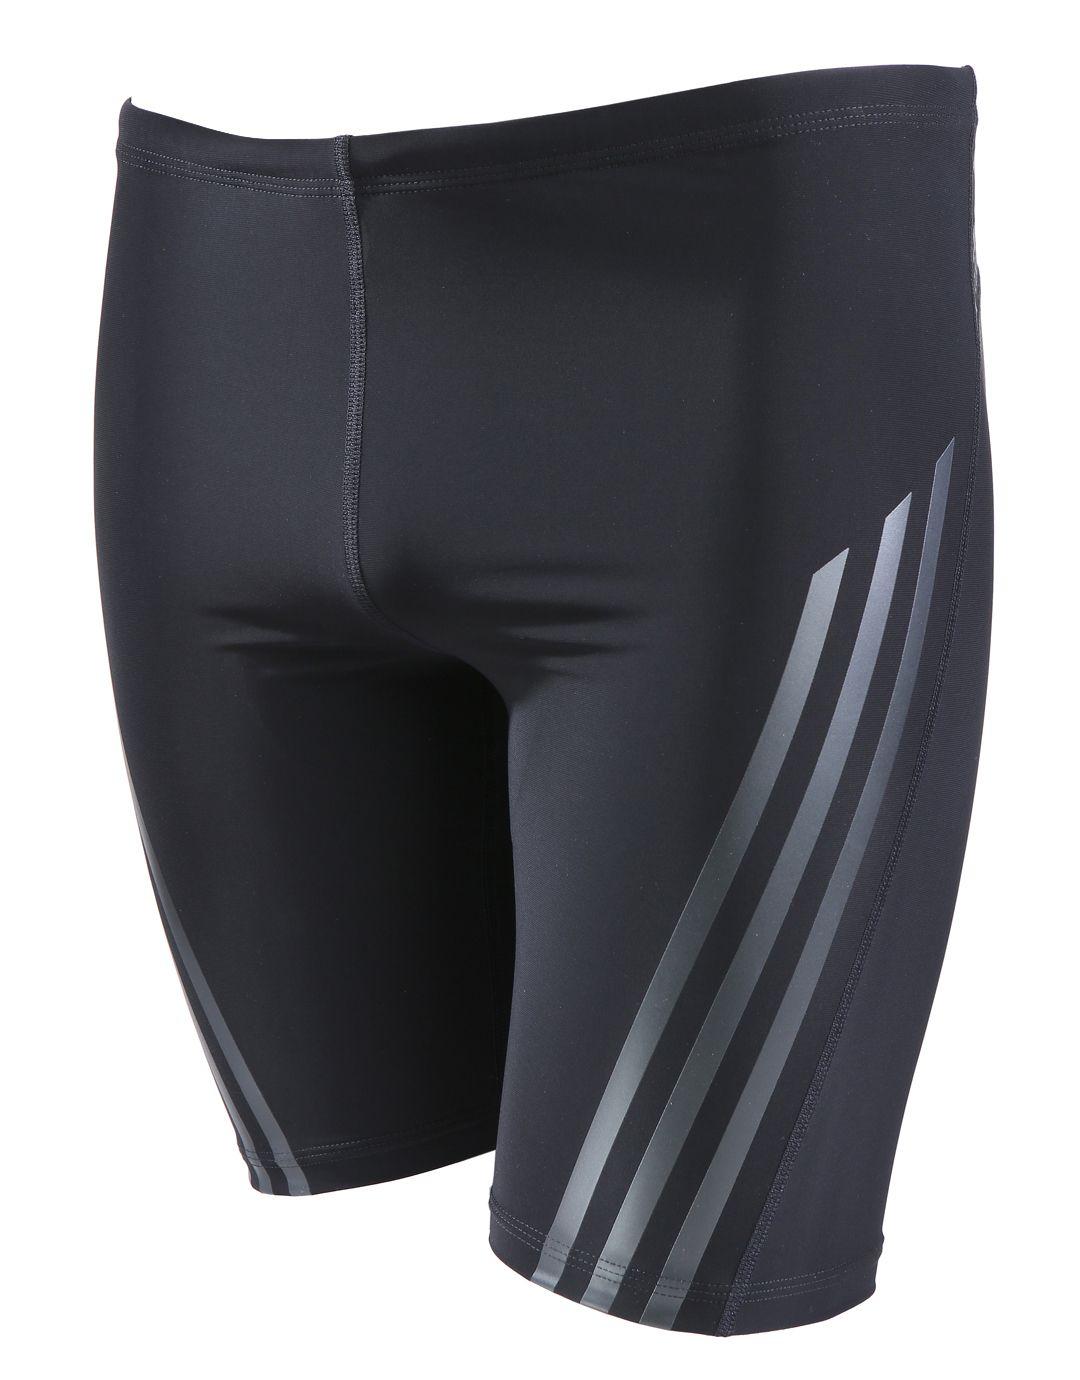 Adidas Streamline 17675 Jammer | Black Streamline | 6c99a27 - allpoints.host